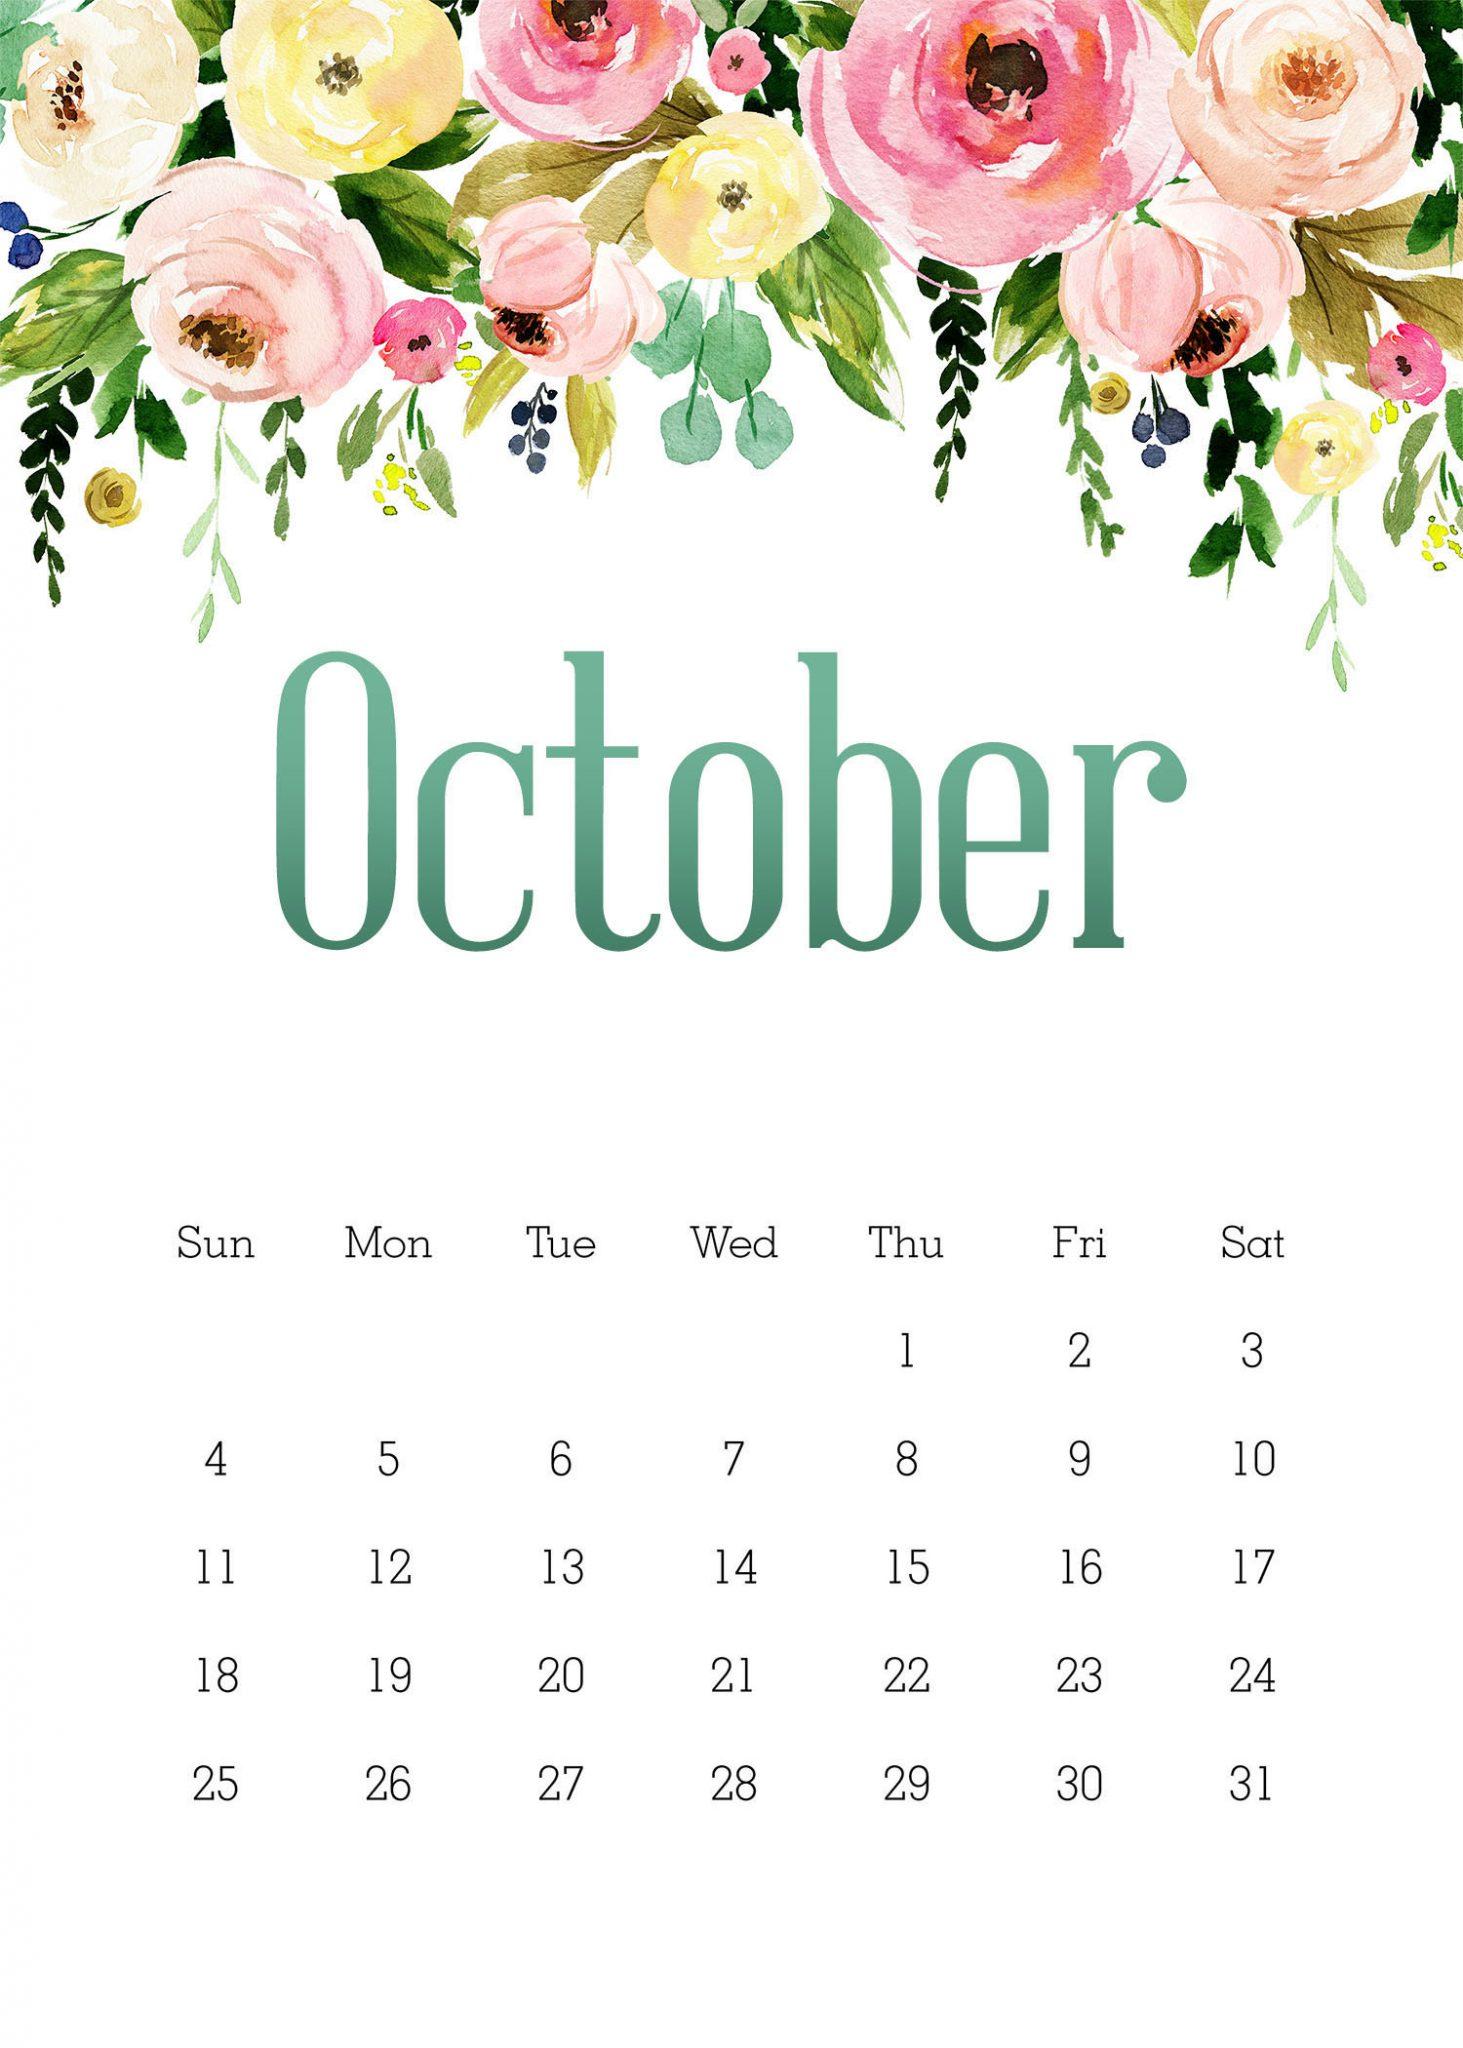 Cute October 2020 Floral Calendar